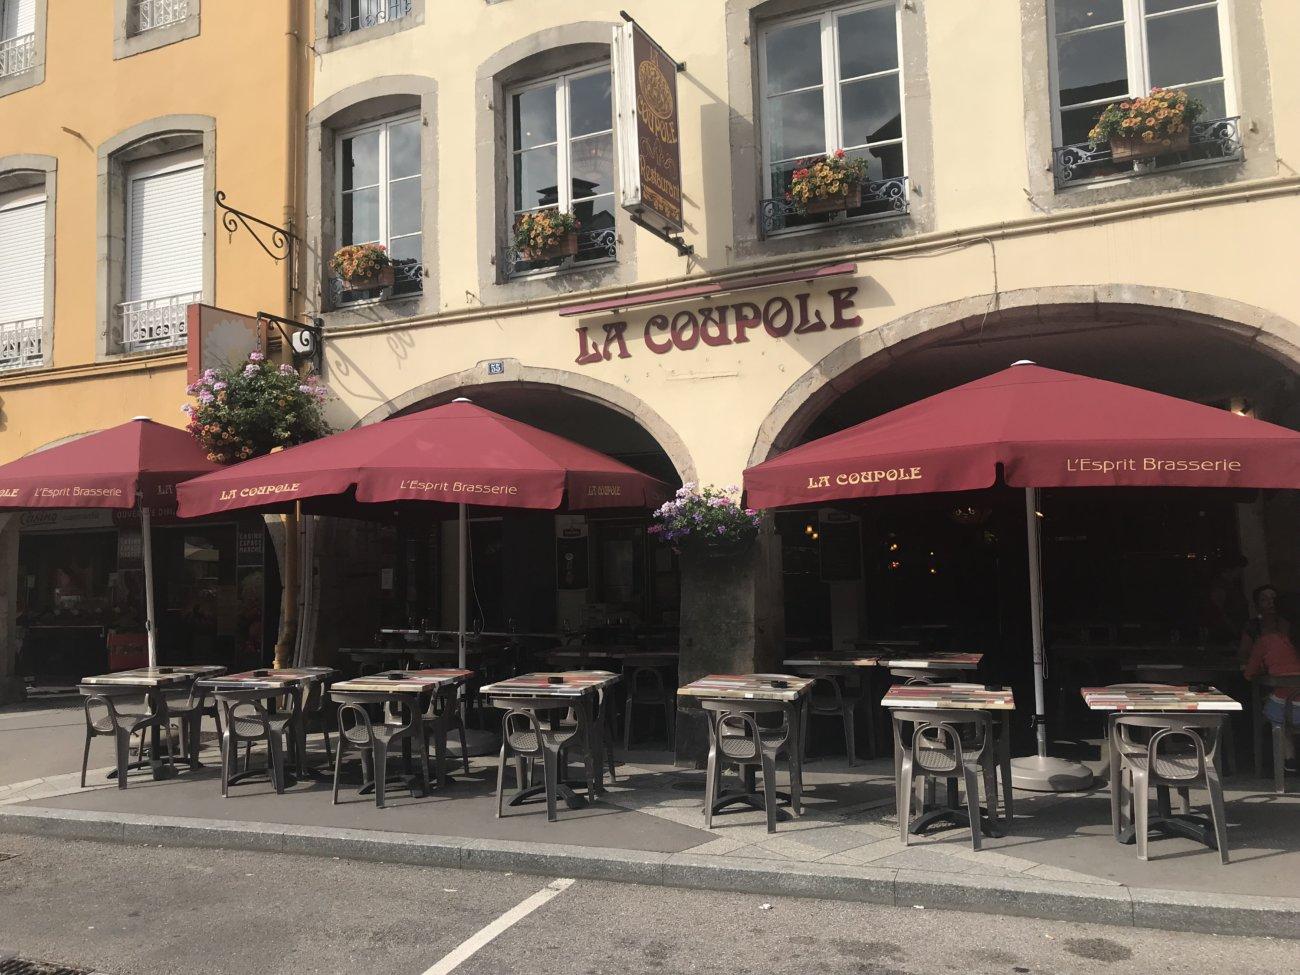 Photo façade La coupole